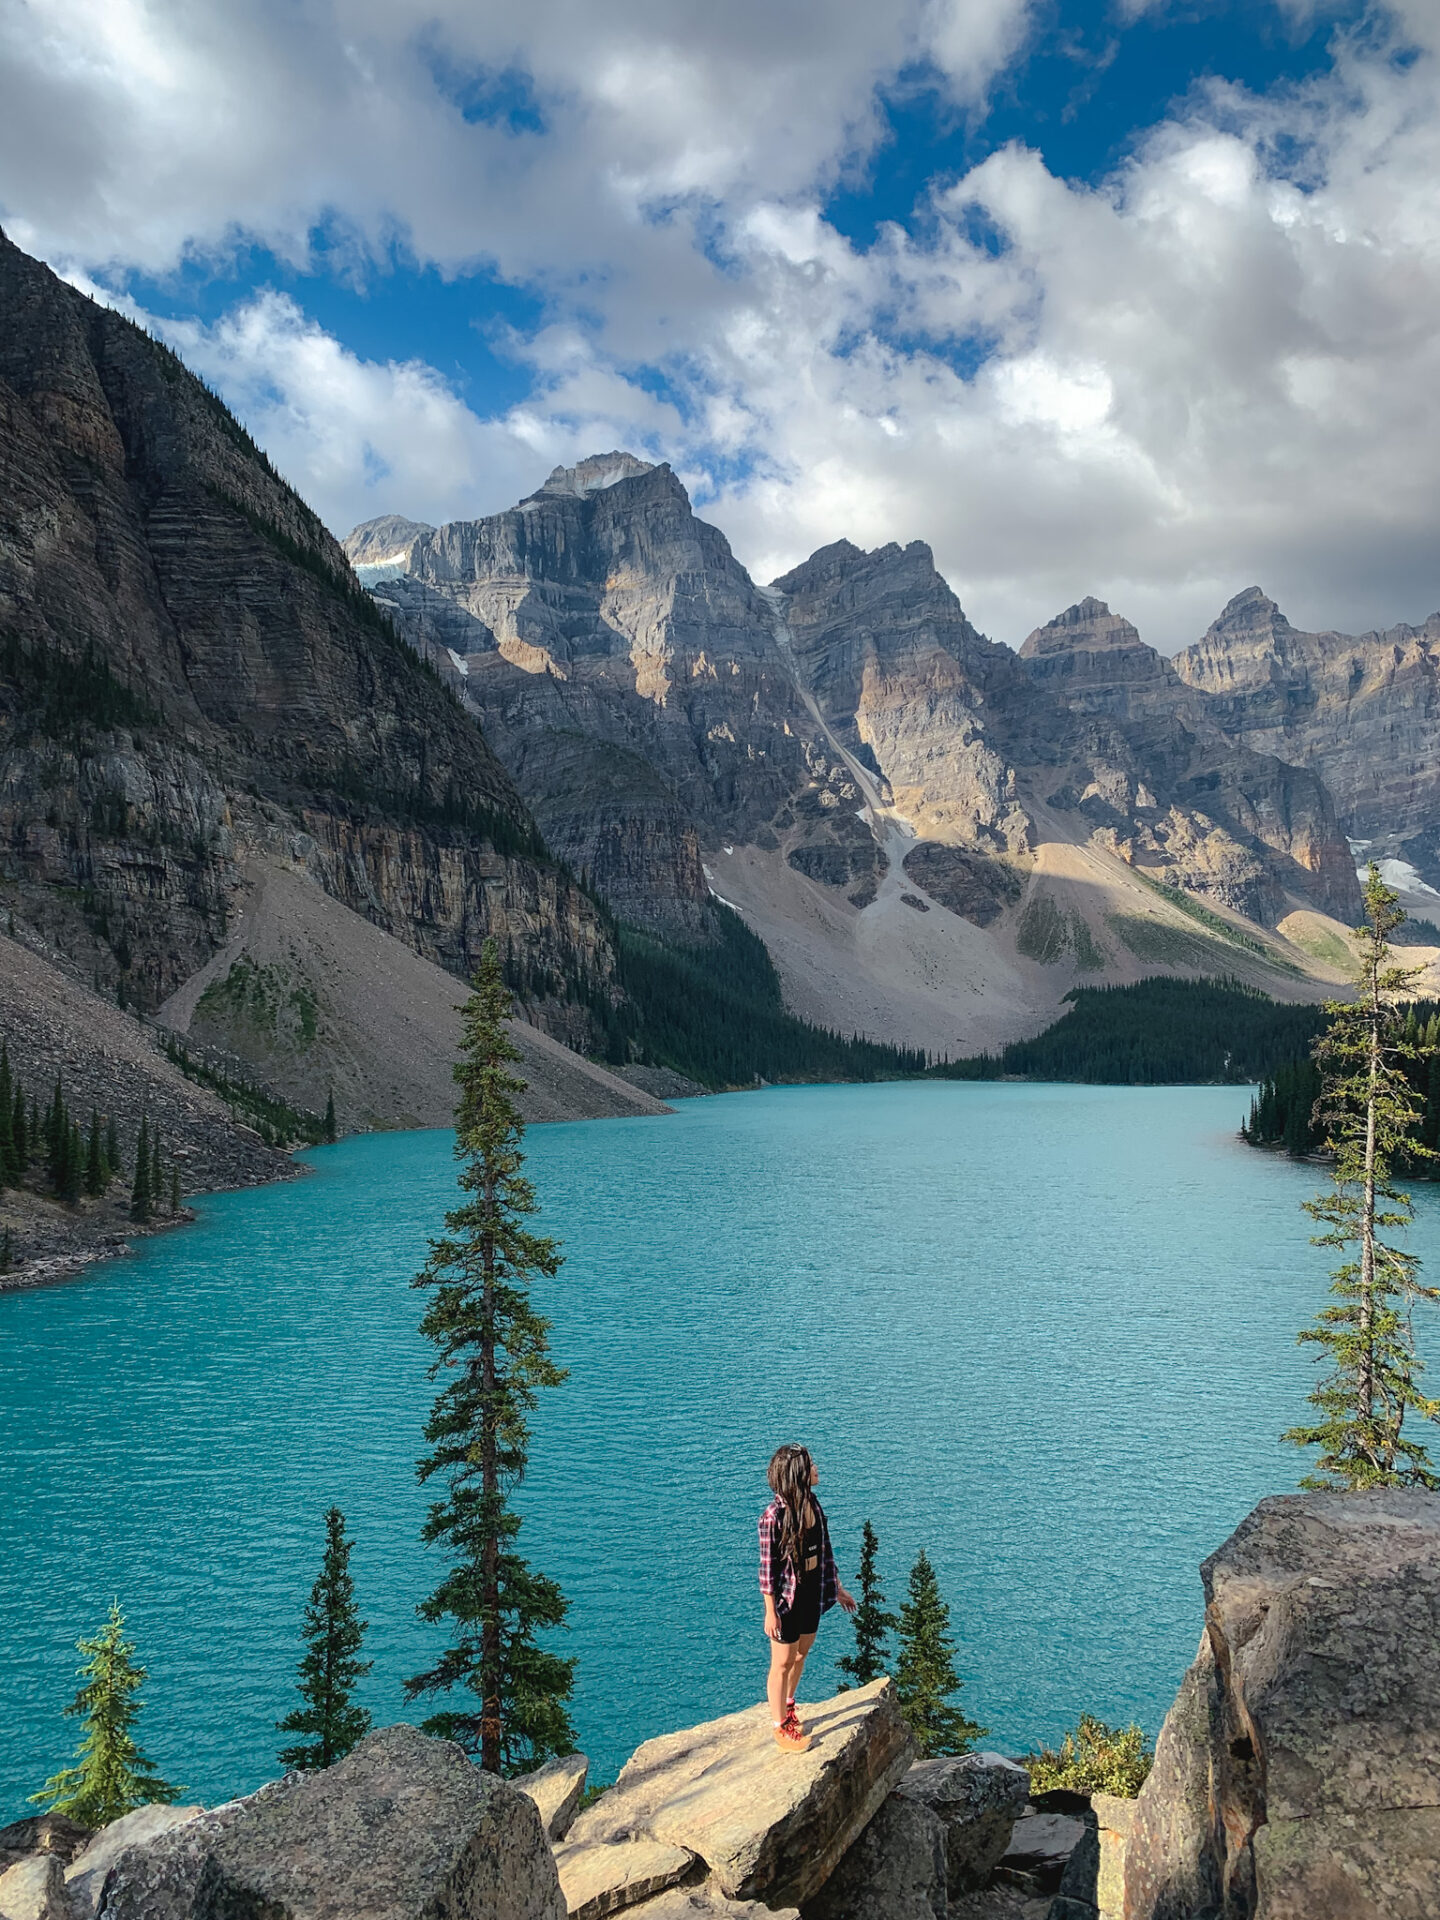 Moraine Lake in Banff, Alberta